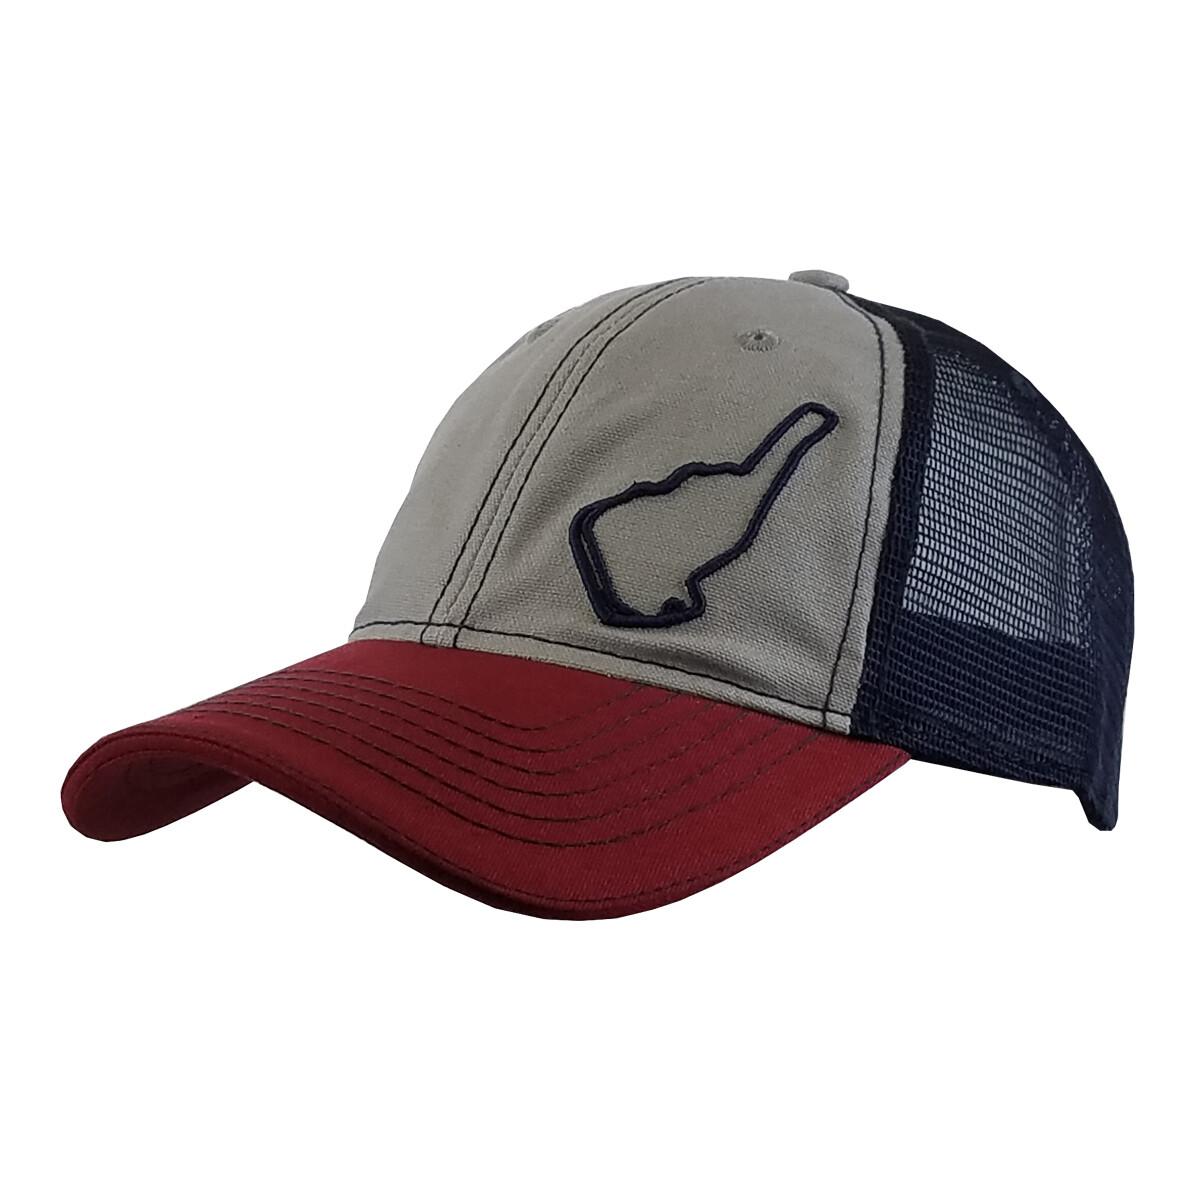 Michelin Raceway Road Atlanta Trucker Mesh Hat-Track Outline-Grey/Navy/Wine